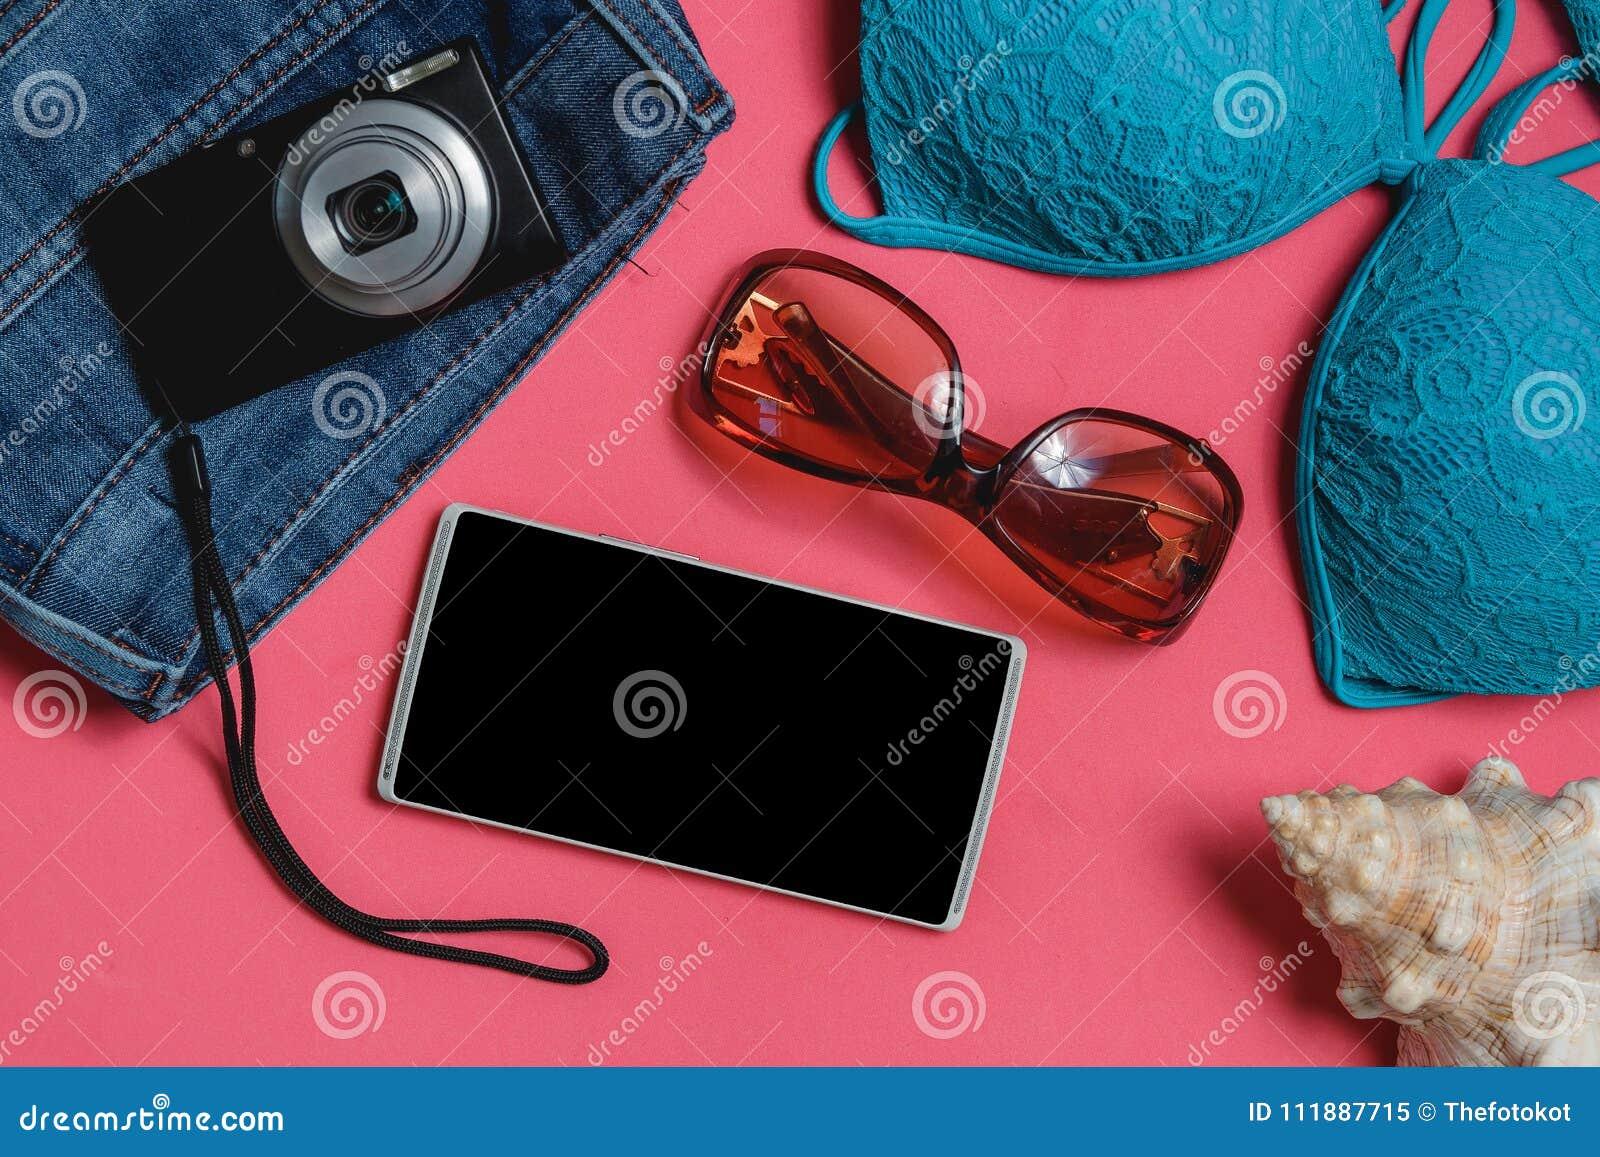 Costume Da Bagno Conchiglia : Smartphone costume da bagno jeans occhiali da sole macchina